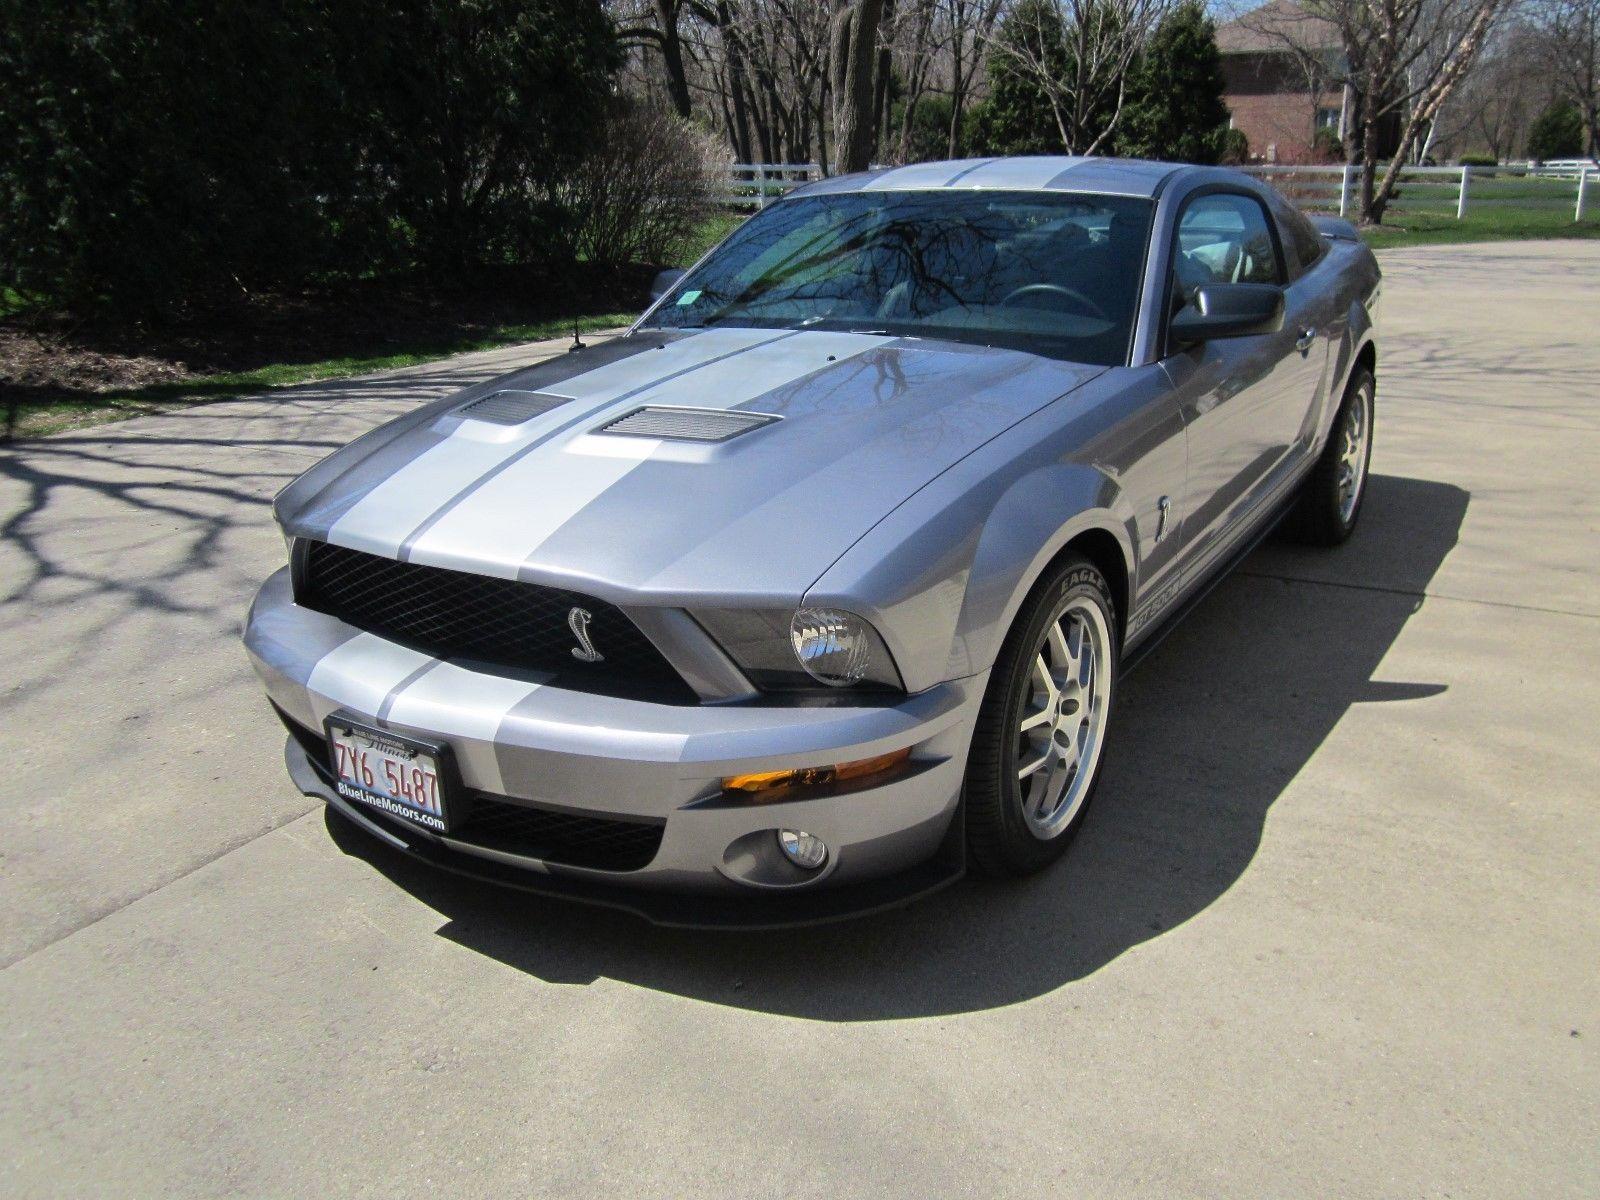 Mustang V6 Premium 2dr Convertible